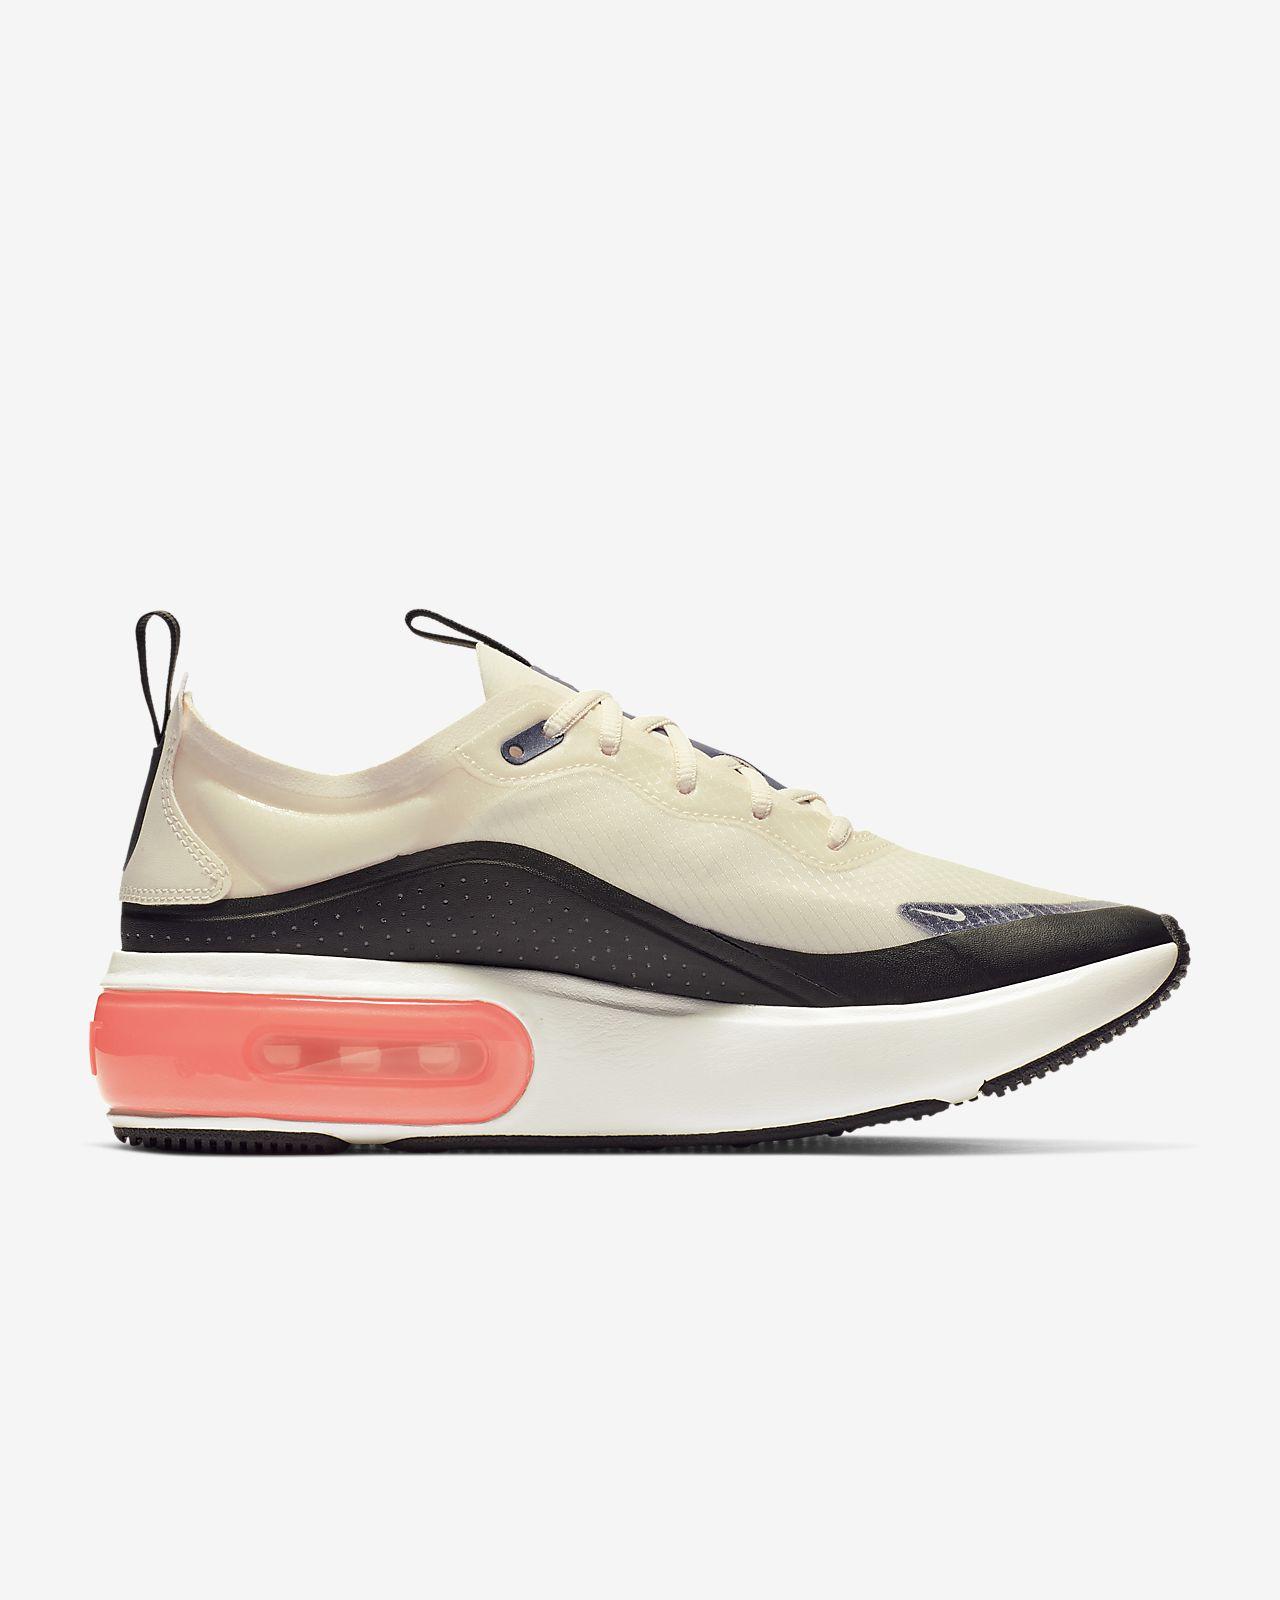 check out b9429 5cc66 ... Nike Air Max Dia SE Shoe